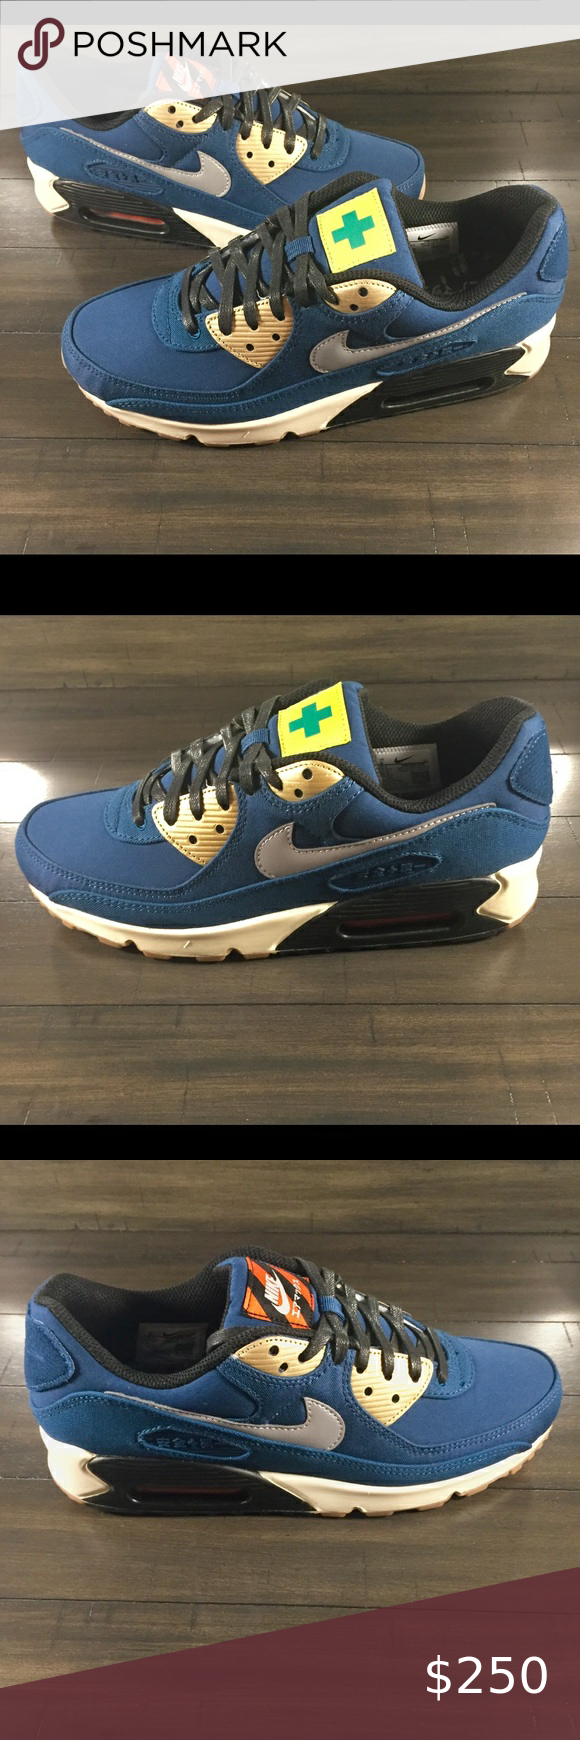 Nike Air Max 90 Tokyo Limited Edition